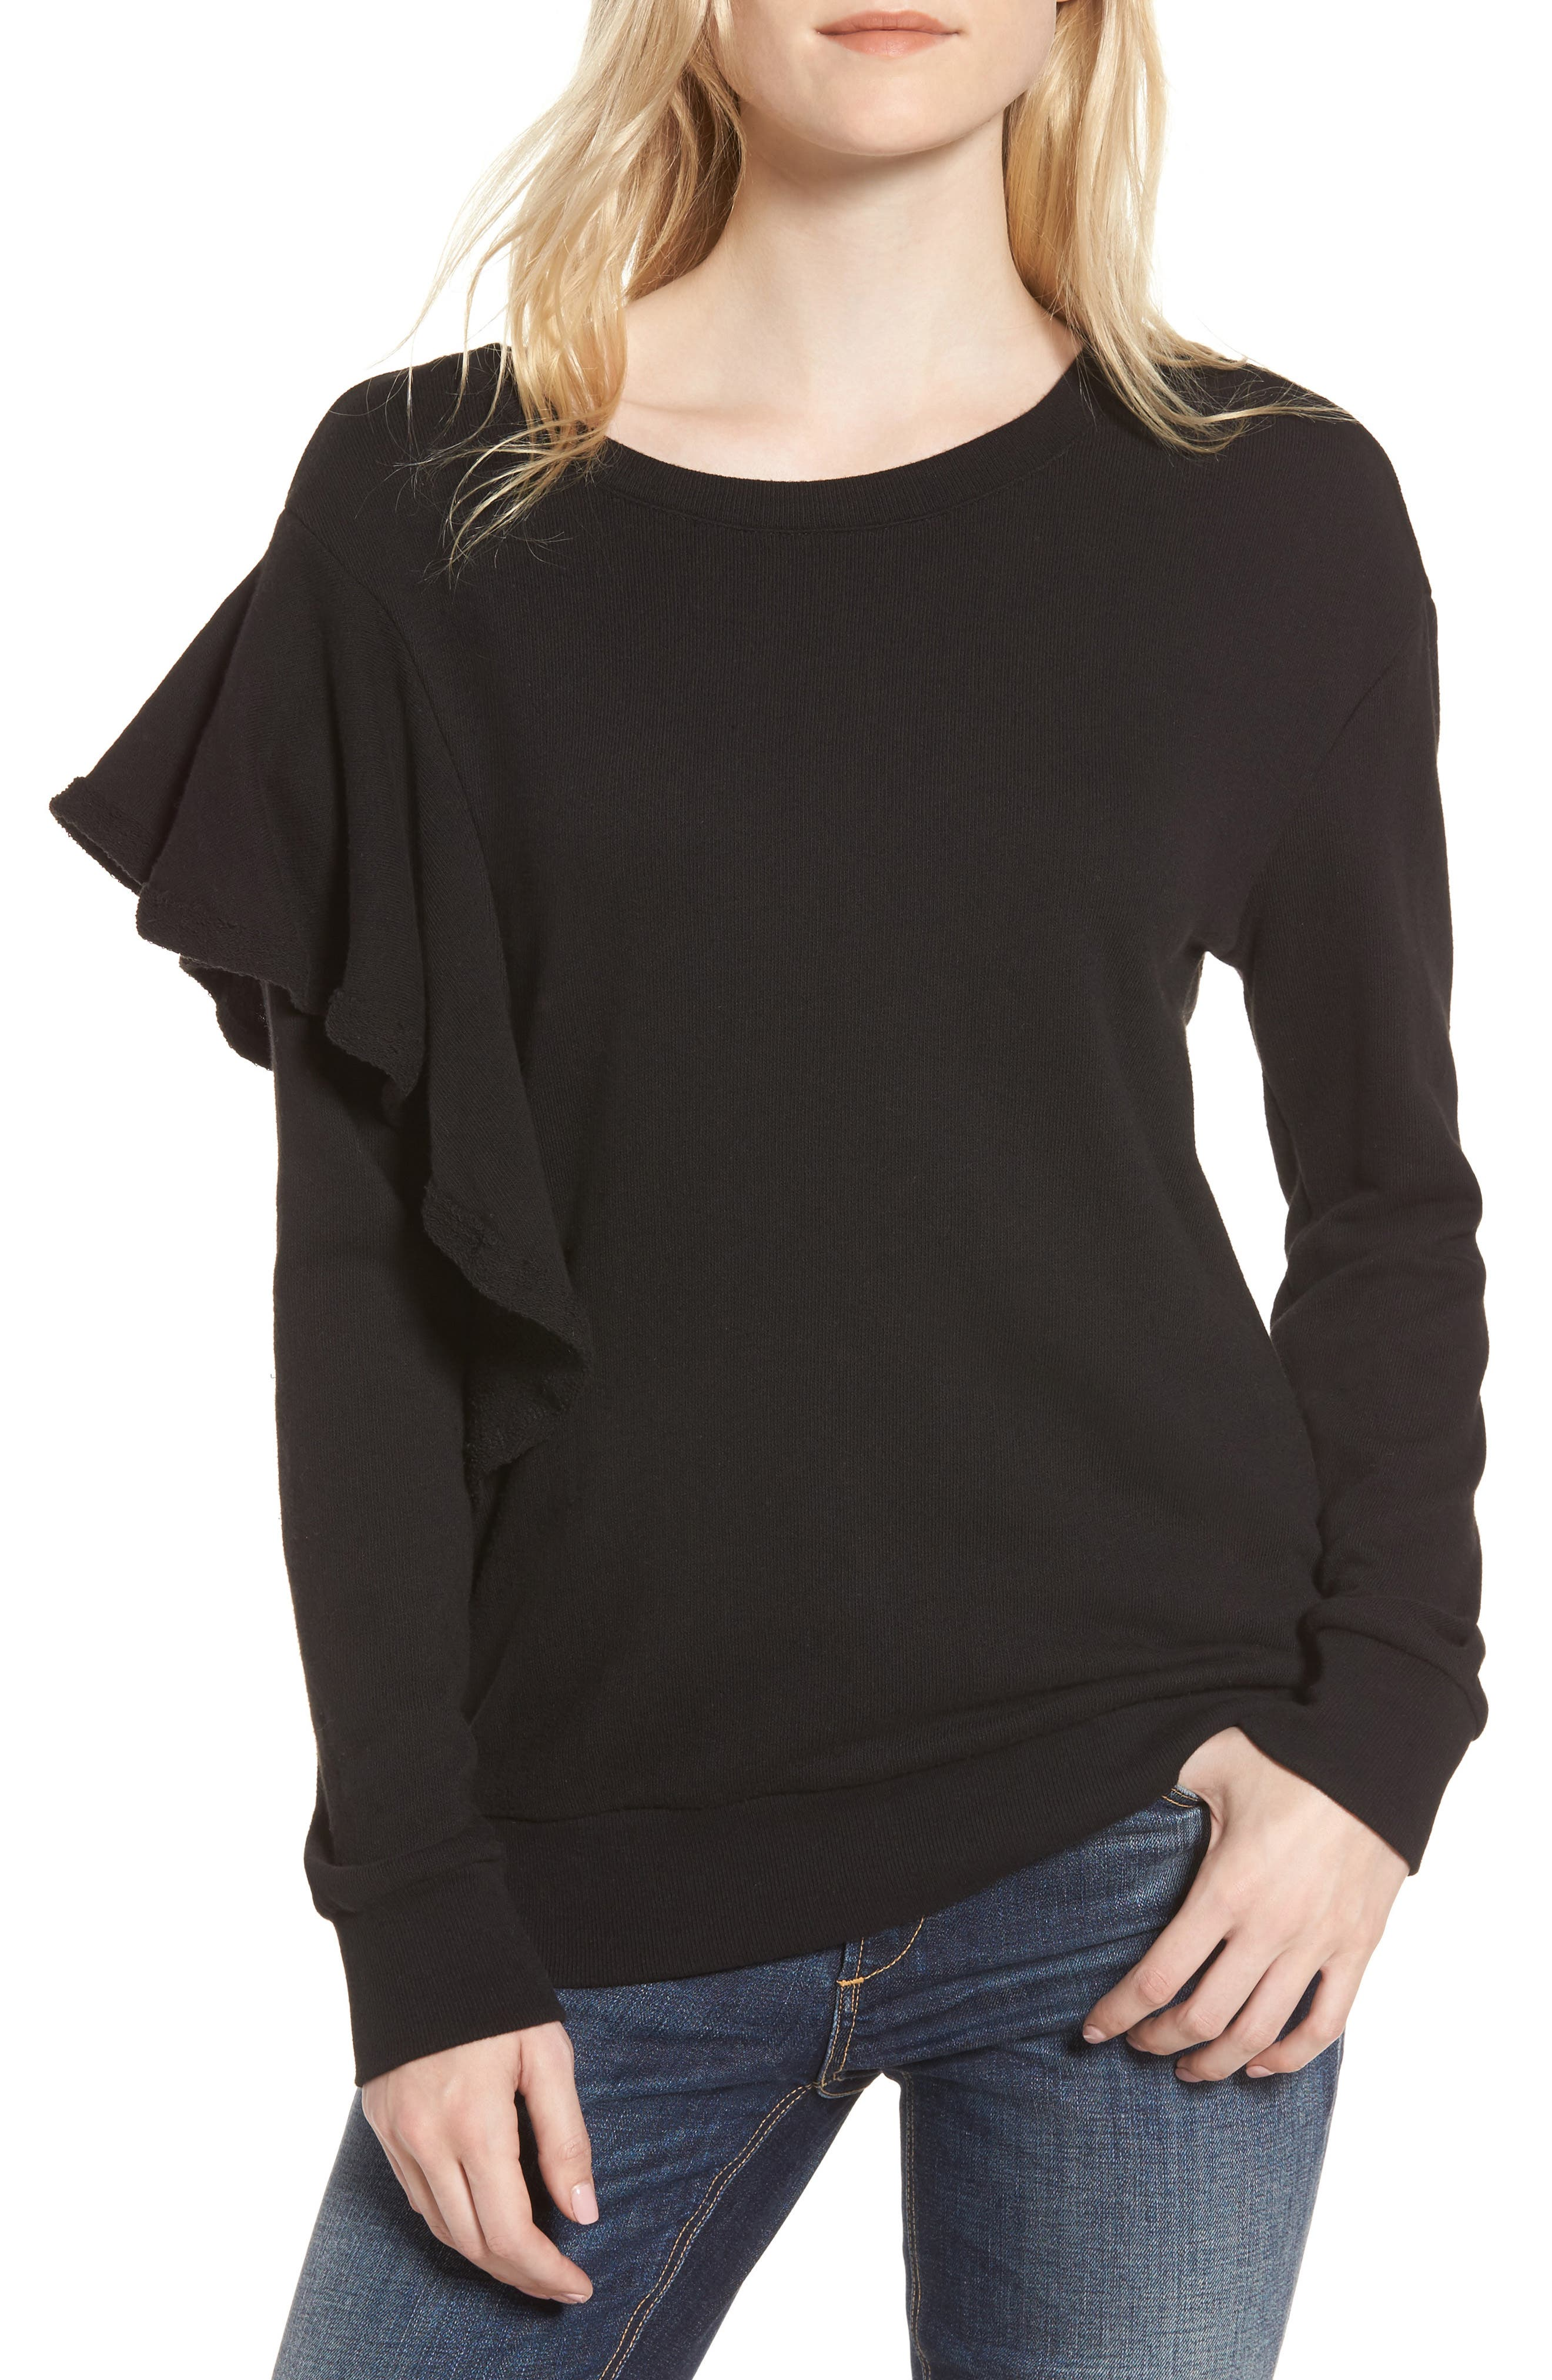 West Fourth Ruffle Sweatshirt,                             Main thumbnail 1, color,                             001